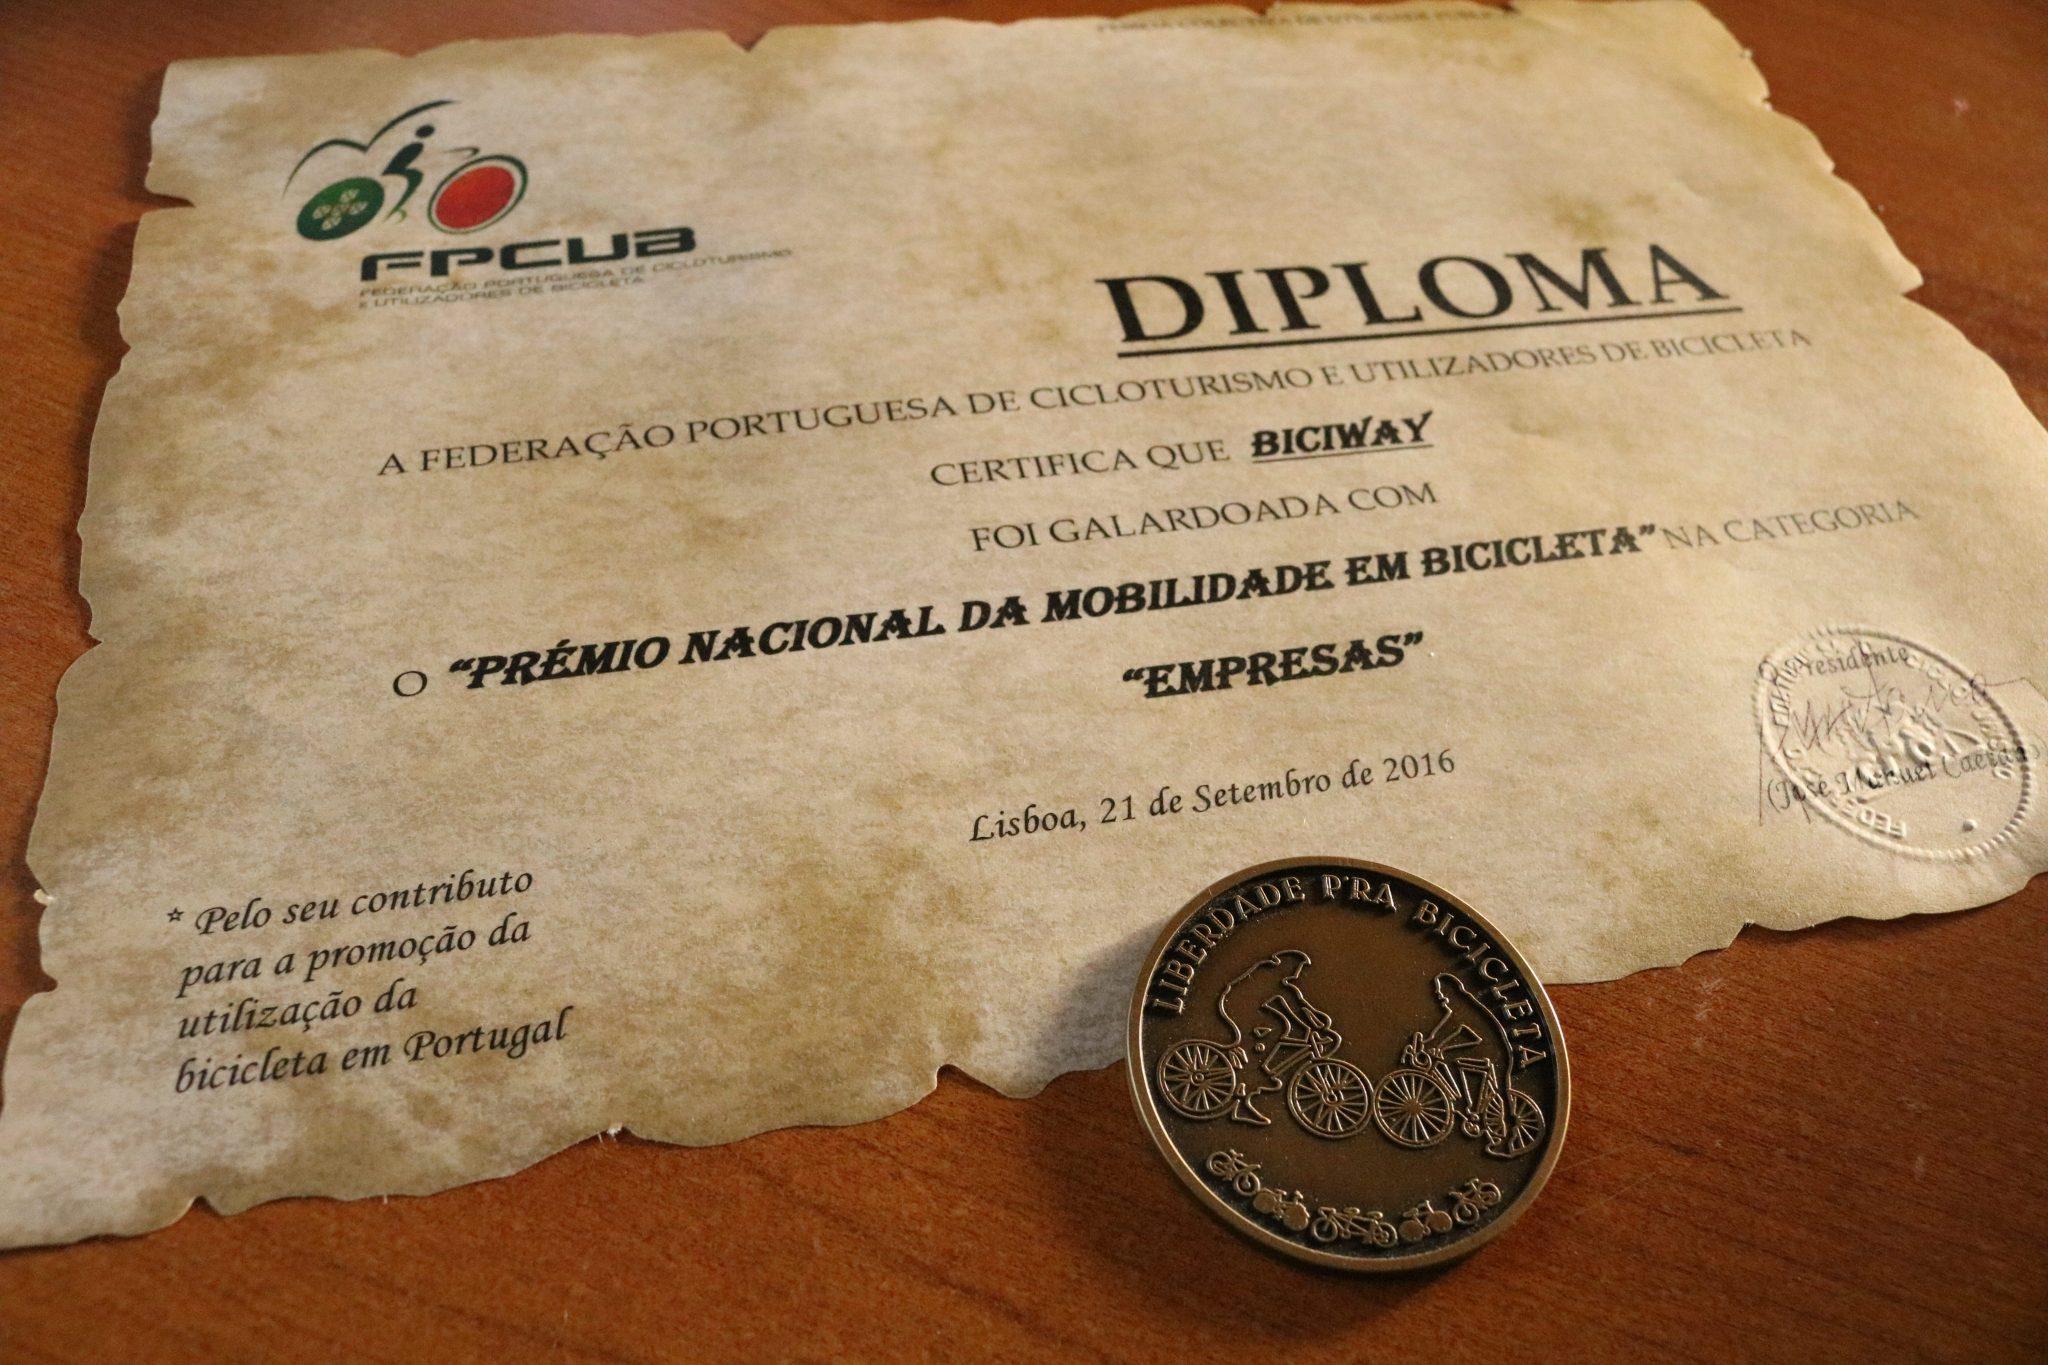 Diploma Mobilidade FPCUB